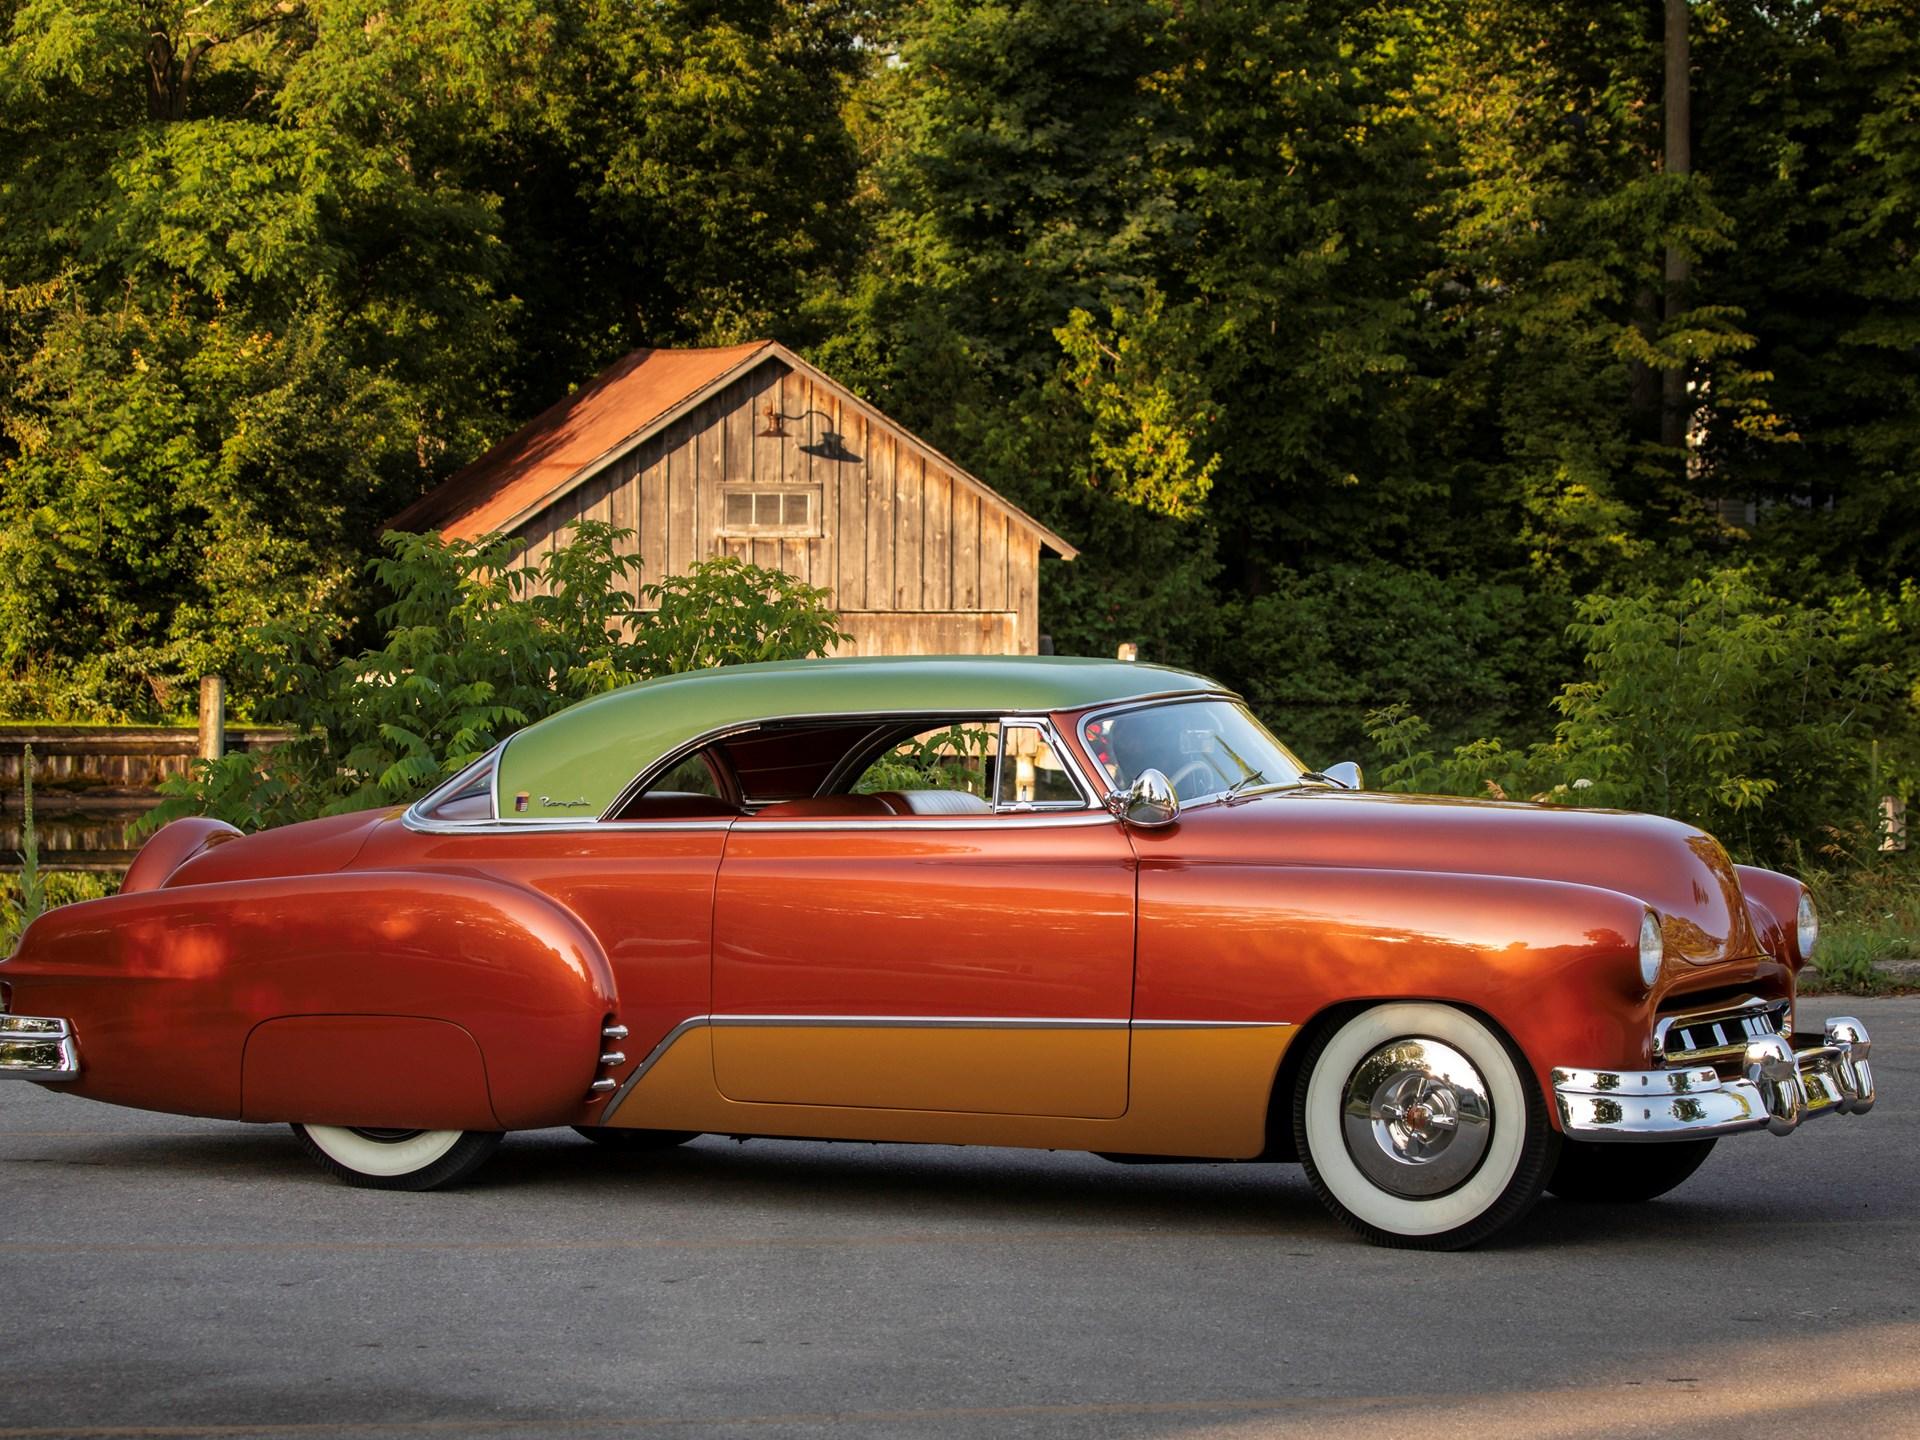 Rm Sothebys 1951 Chevrolet Bel Air Royal Recreation Auburn Fall 2 Door Hardtop